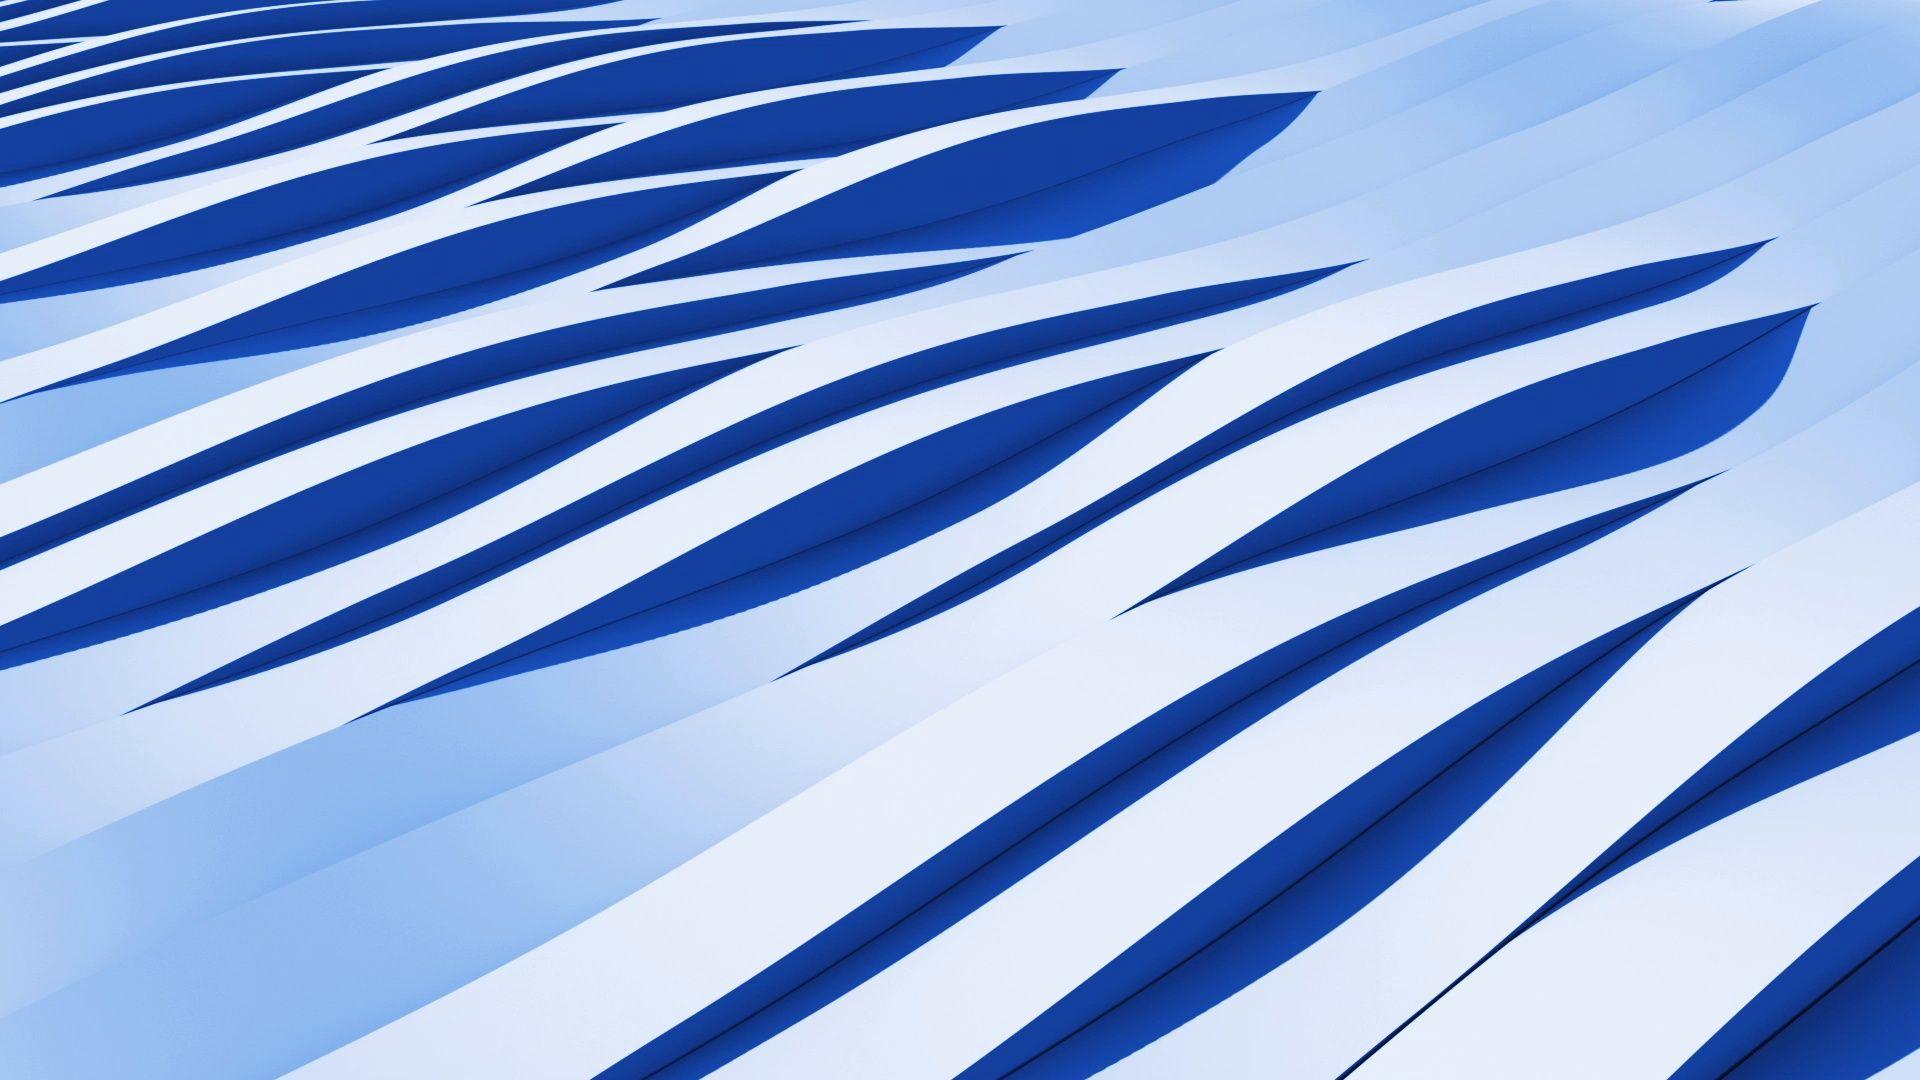 Waves Loop corporate background Stock Footage,#corporate